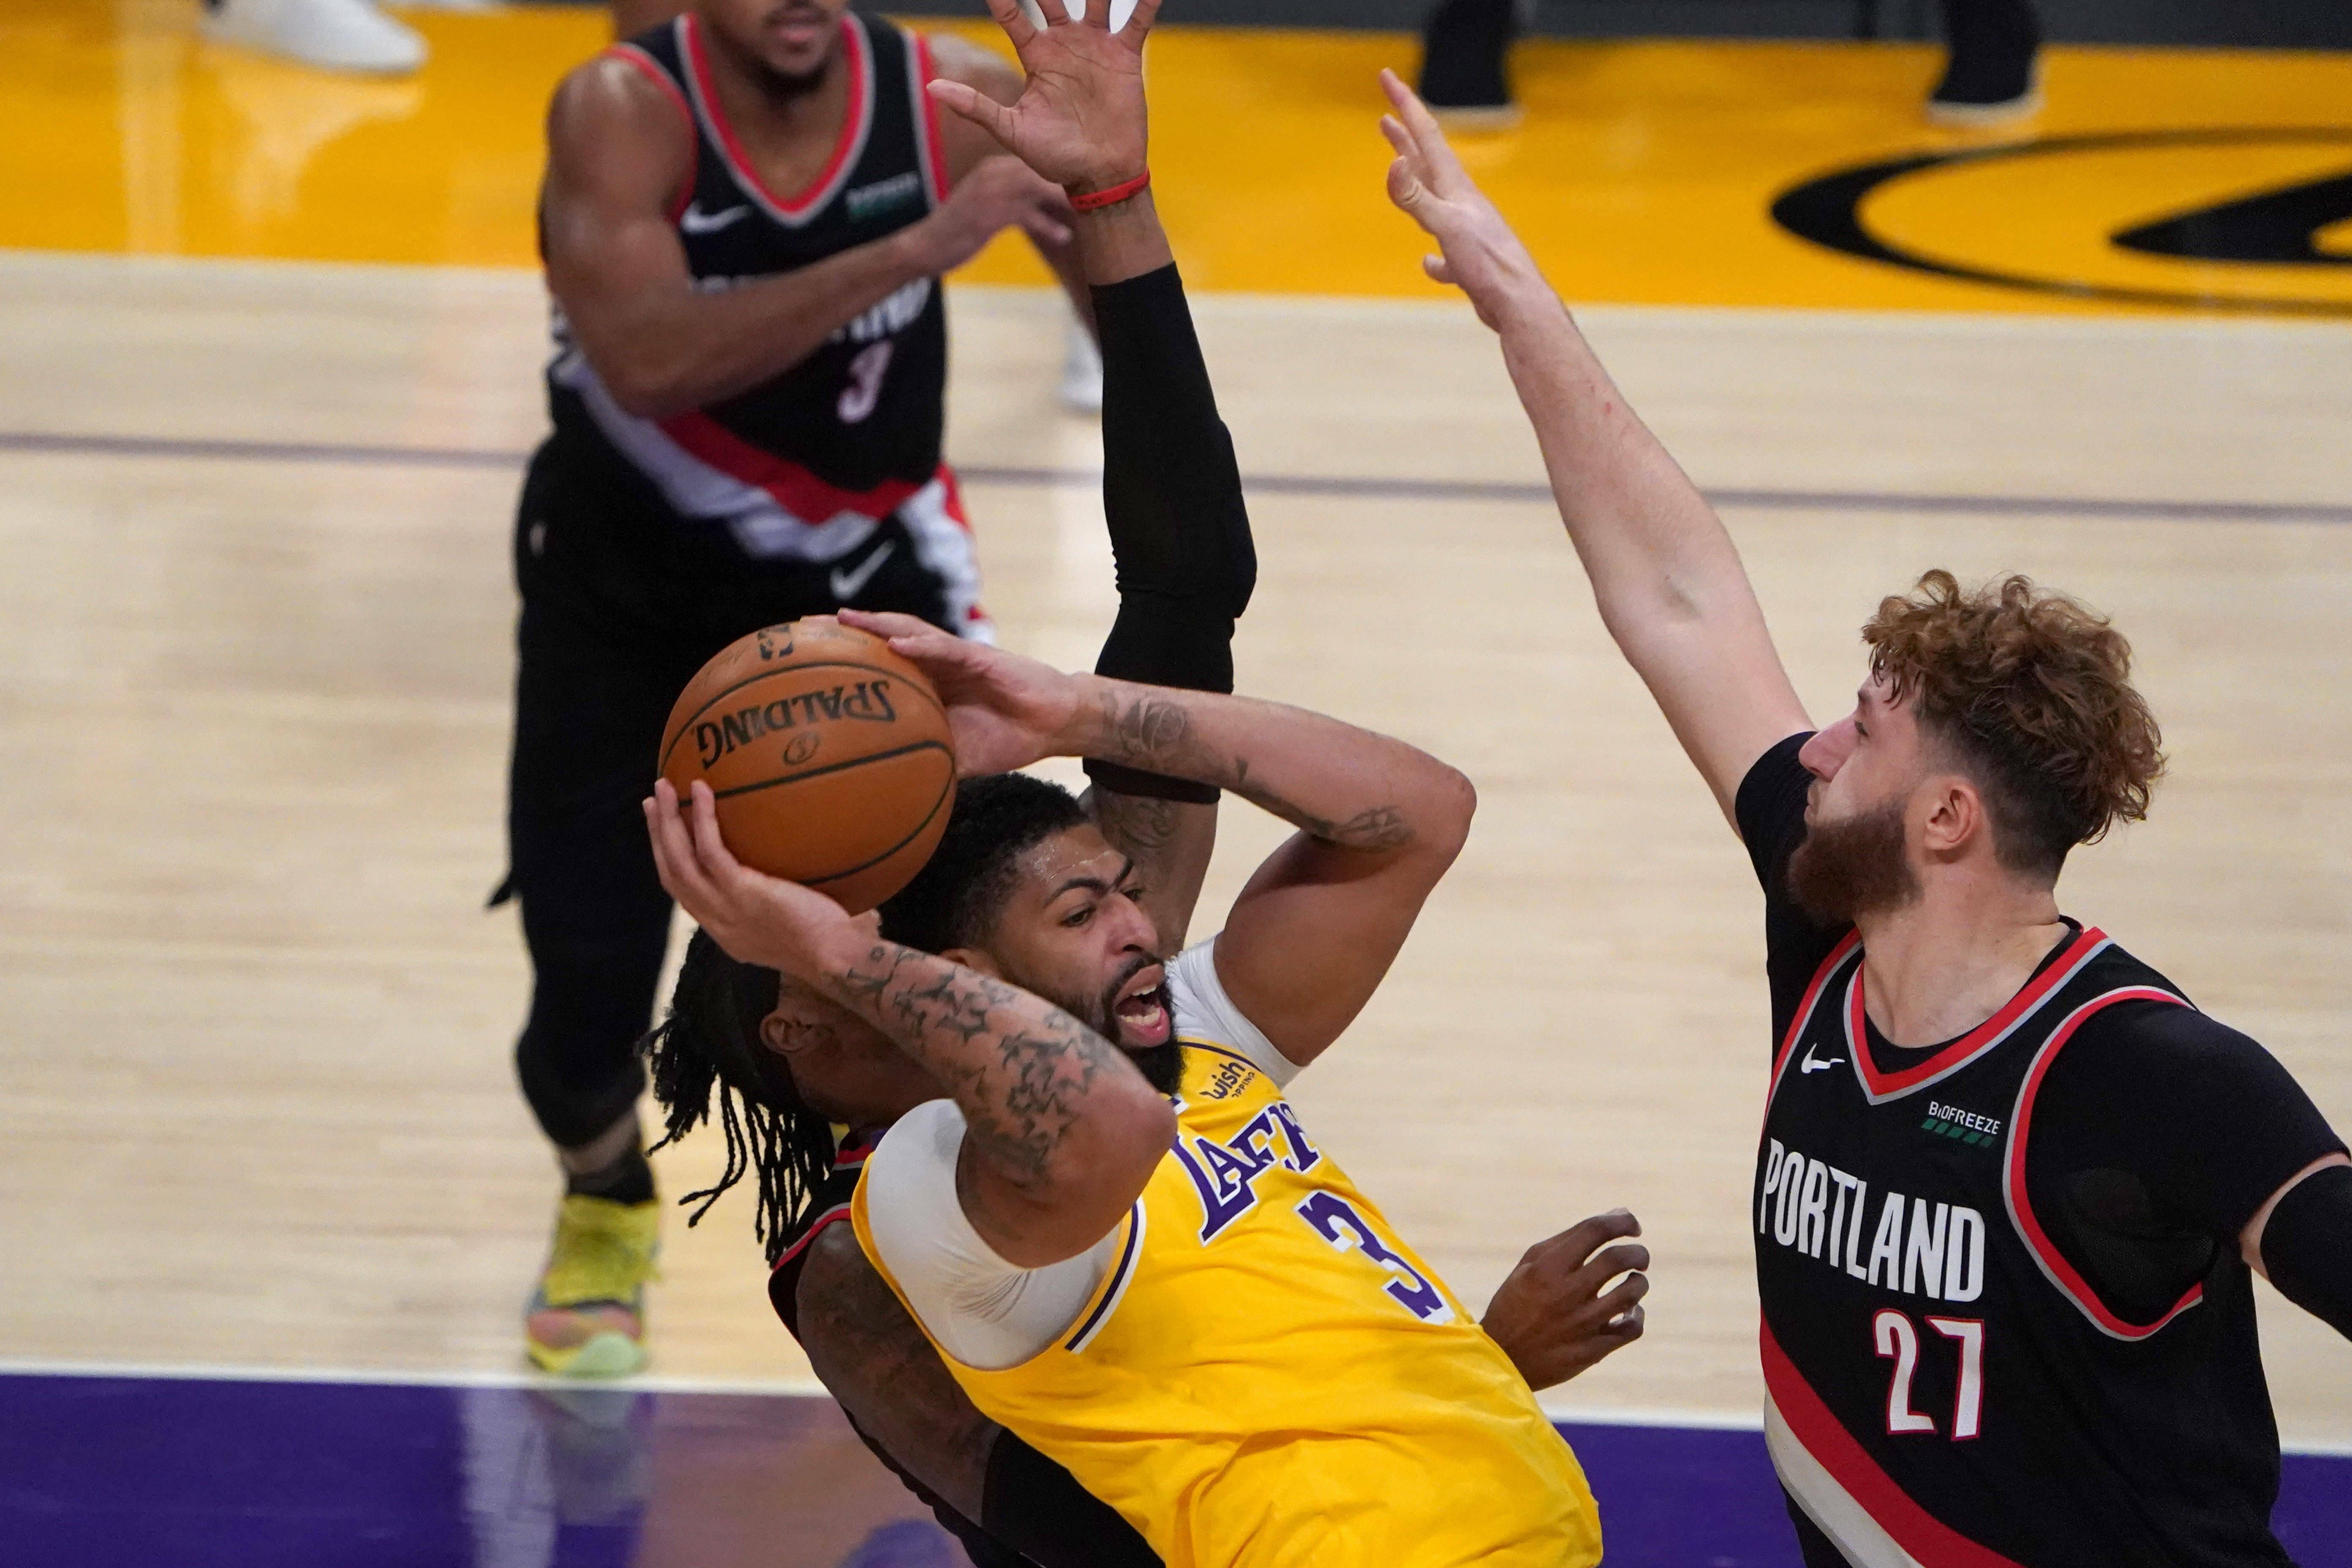 Penyerang Los Angeles Lakers Anthony Davis (3) berebut bola dengan penyerang Portland Trail Blazers Robert Covington (23) dan center Jusuf Nurkic (27)